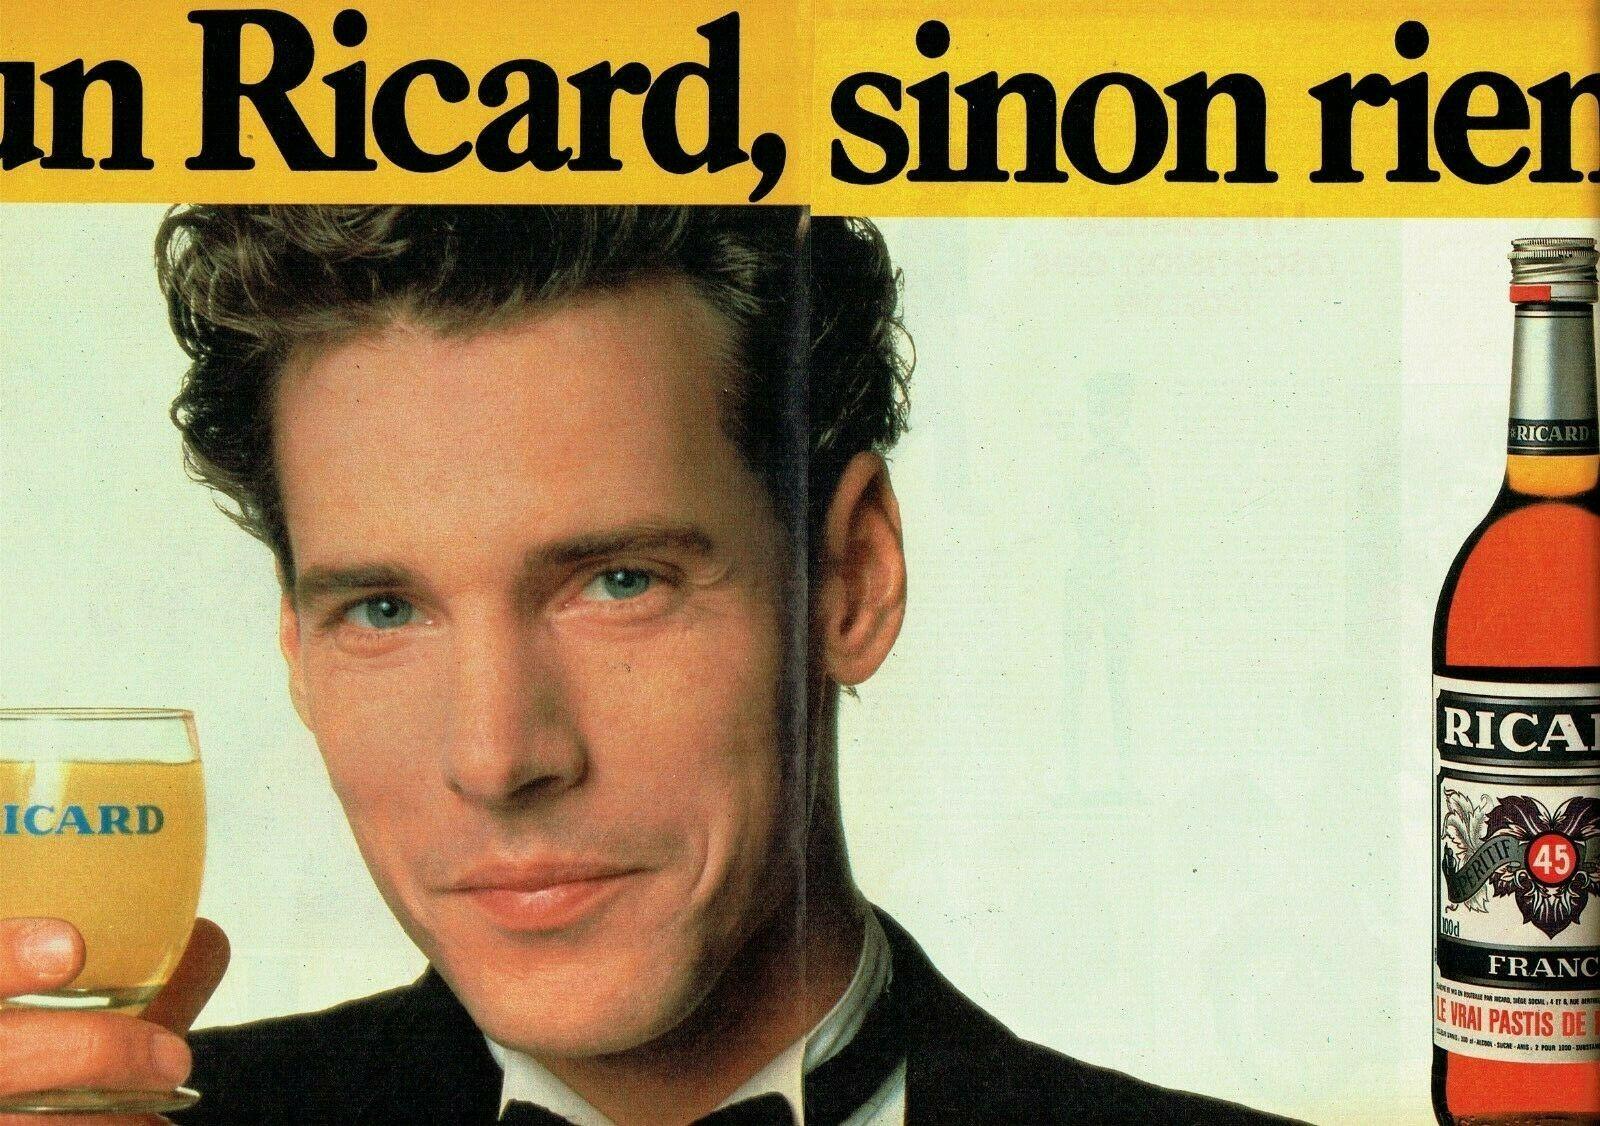 Ricard 1985 Un Ricard sinon rien homme